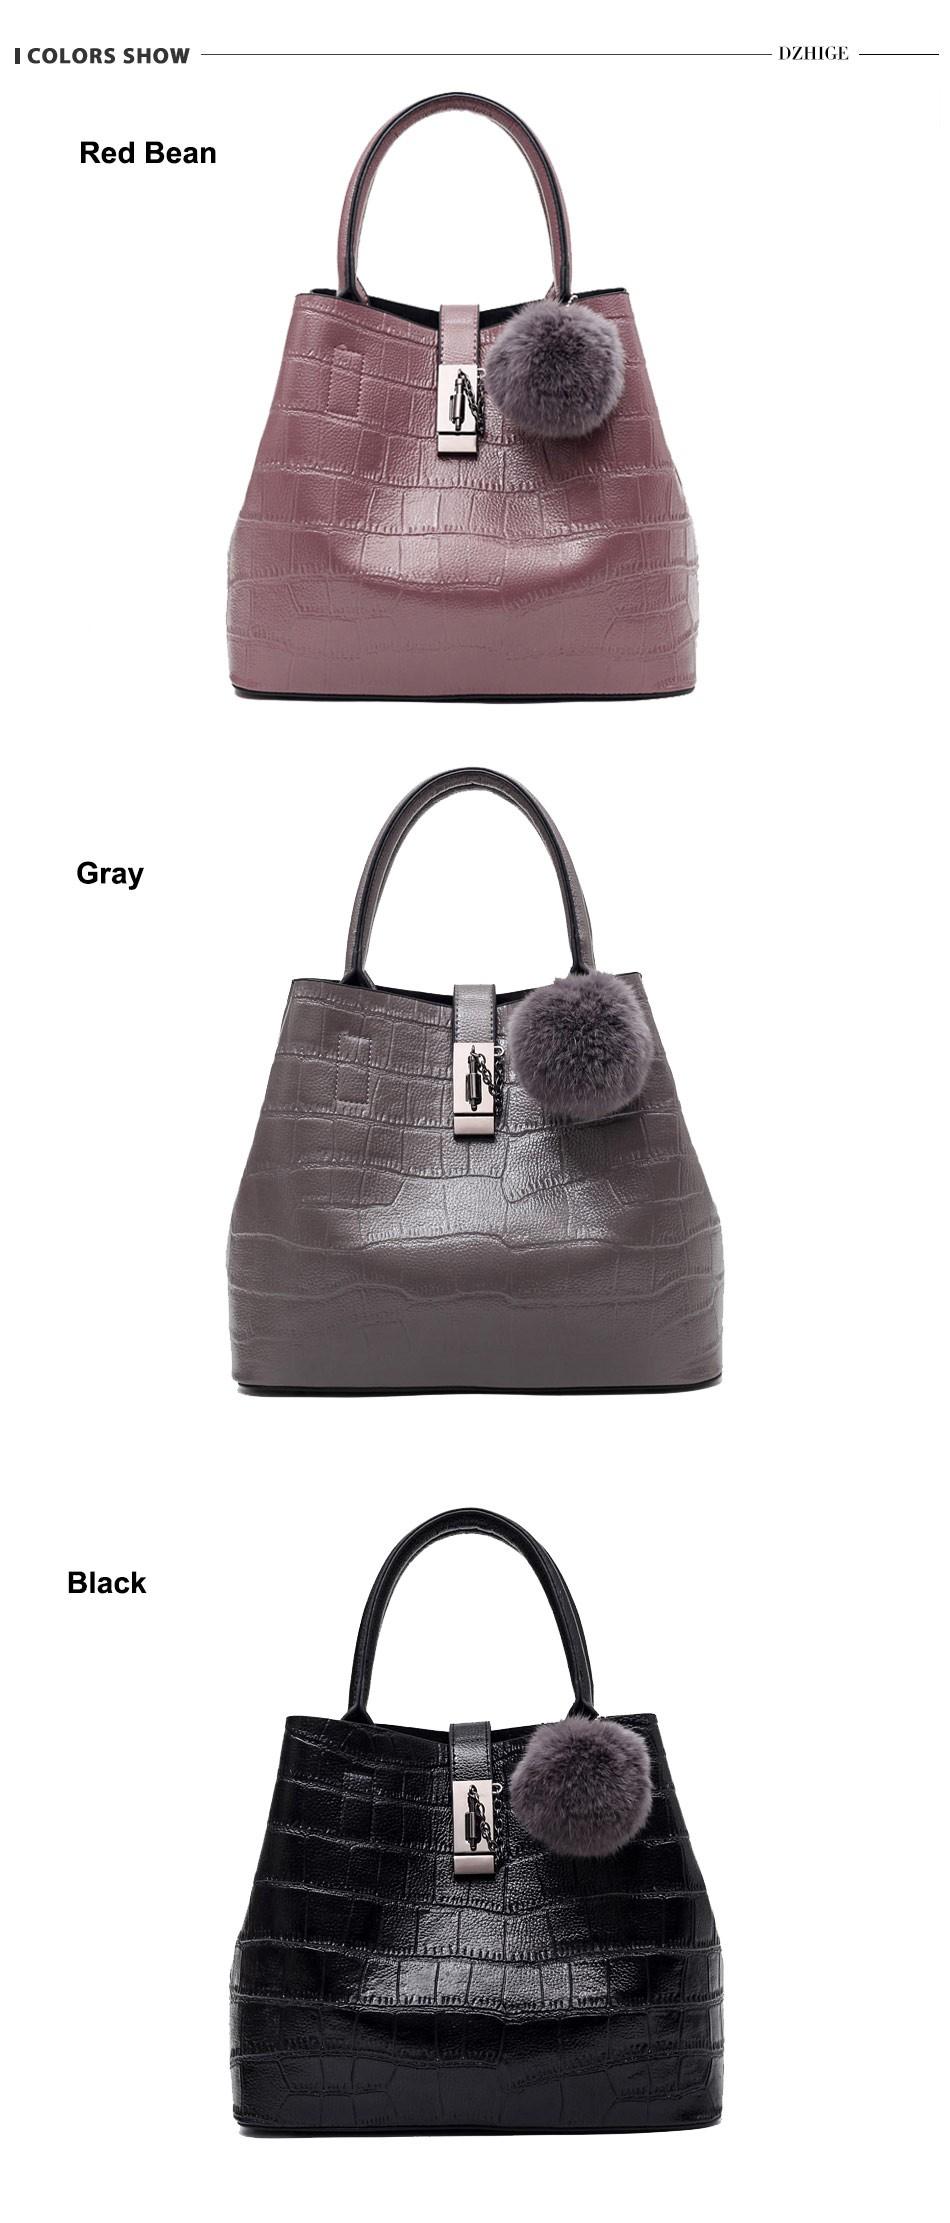 0bd2ec2ed9 2017 Fashion Large Capacity Oil Wax Leather Shoulder Bag Casual High  Quality PU Leather Women Messenger Bag Sac A Main de marqueUSD 46.98 piece